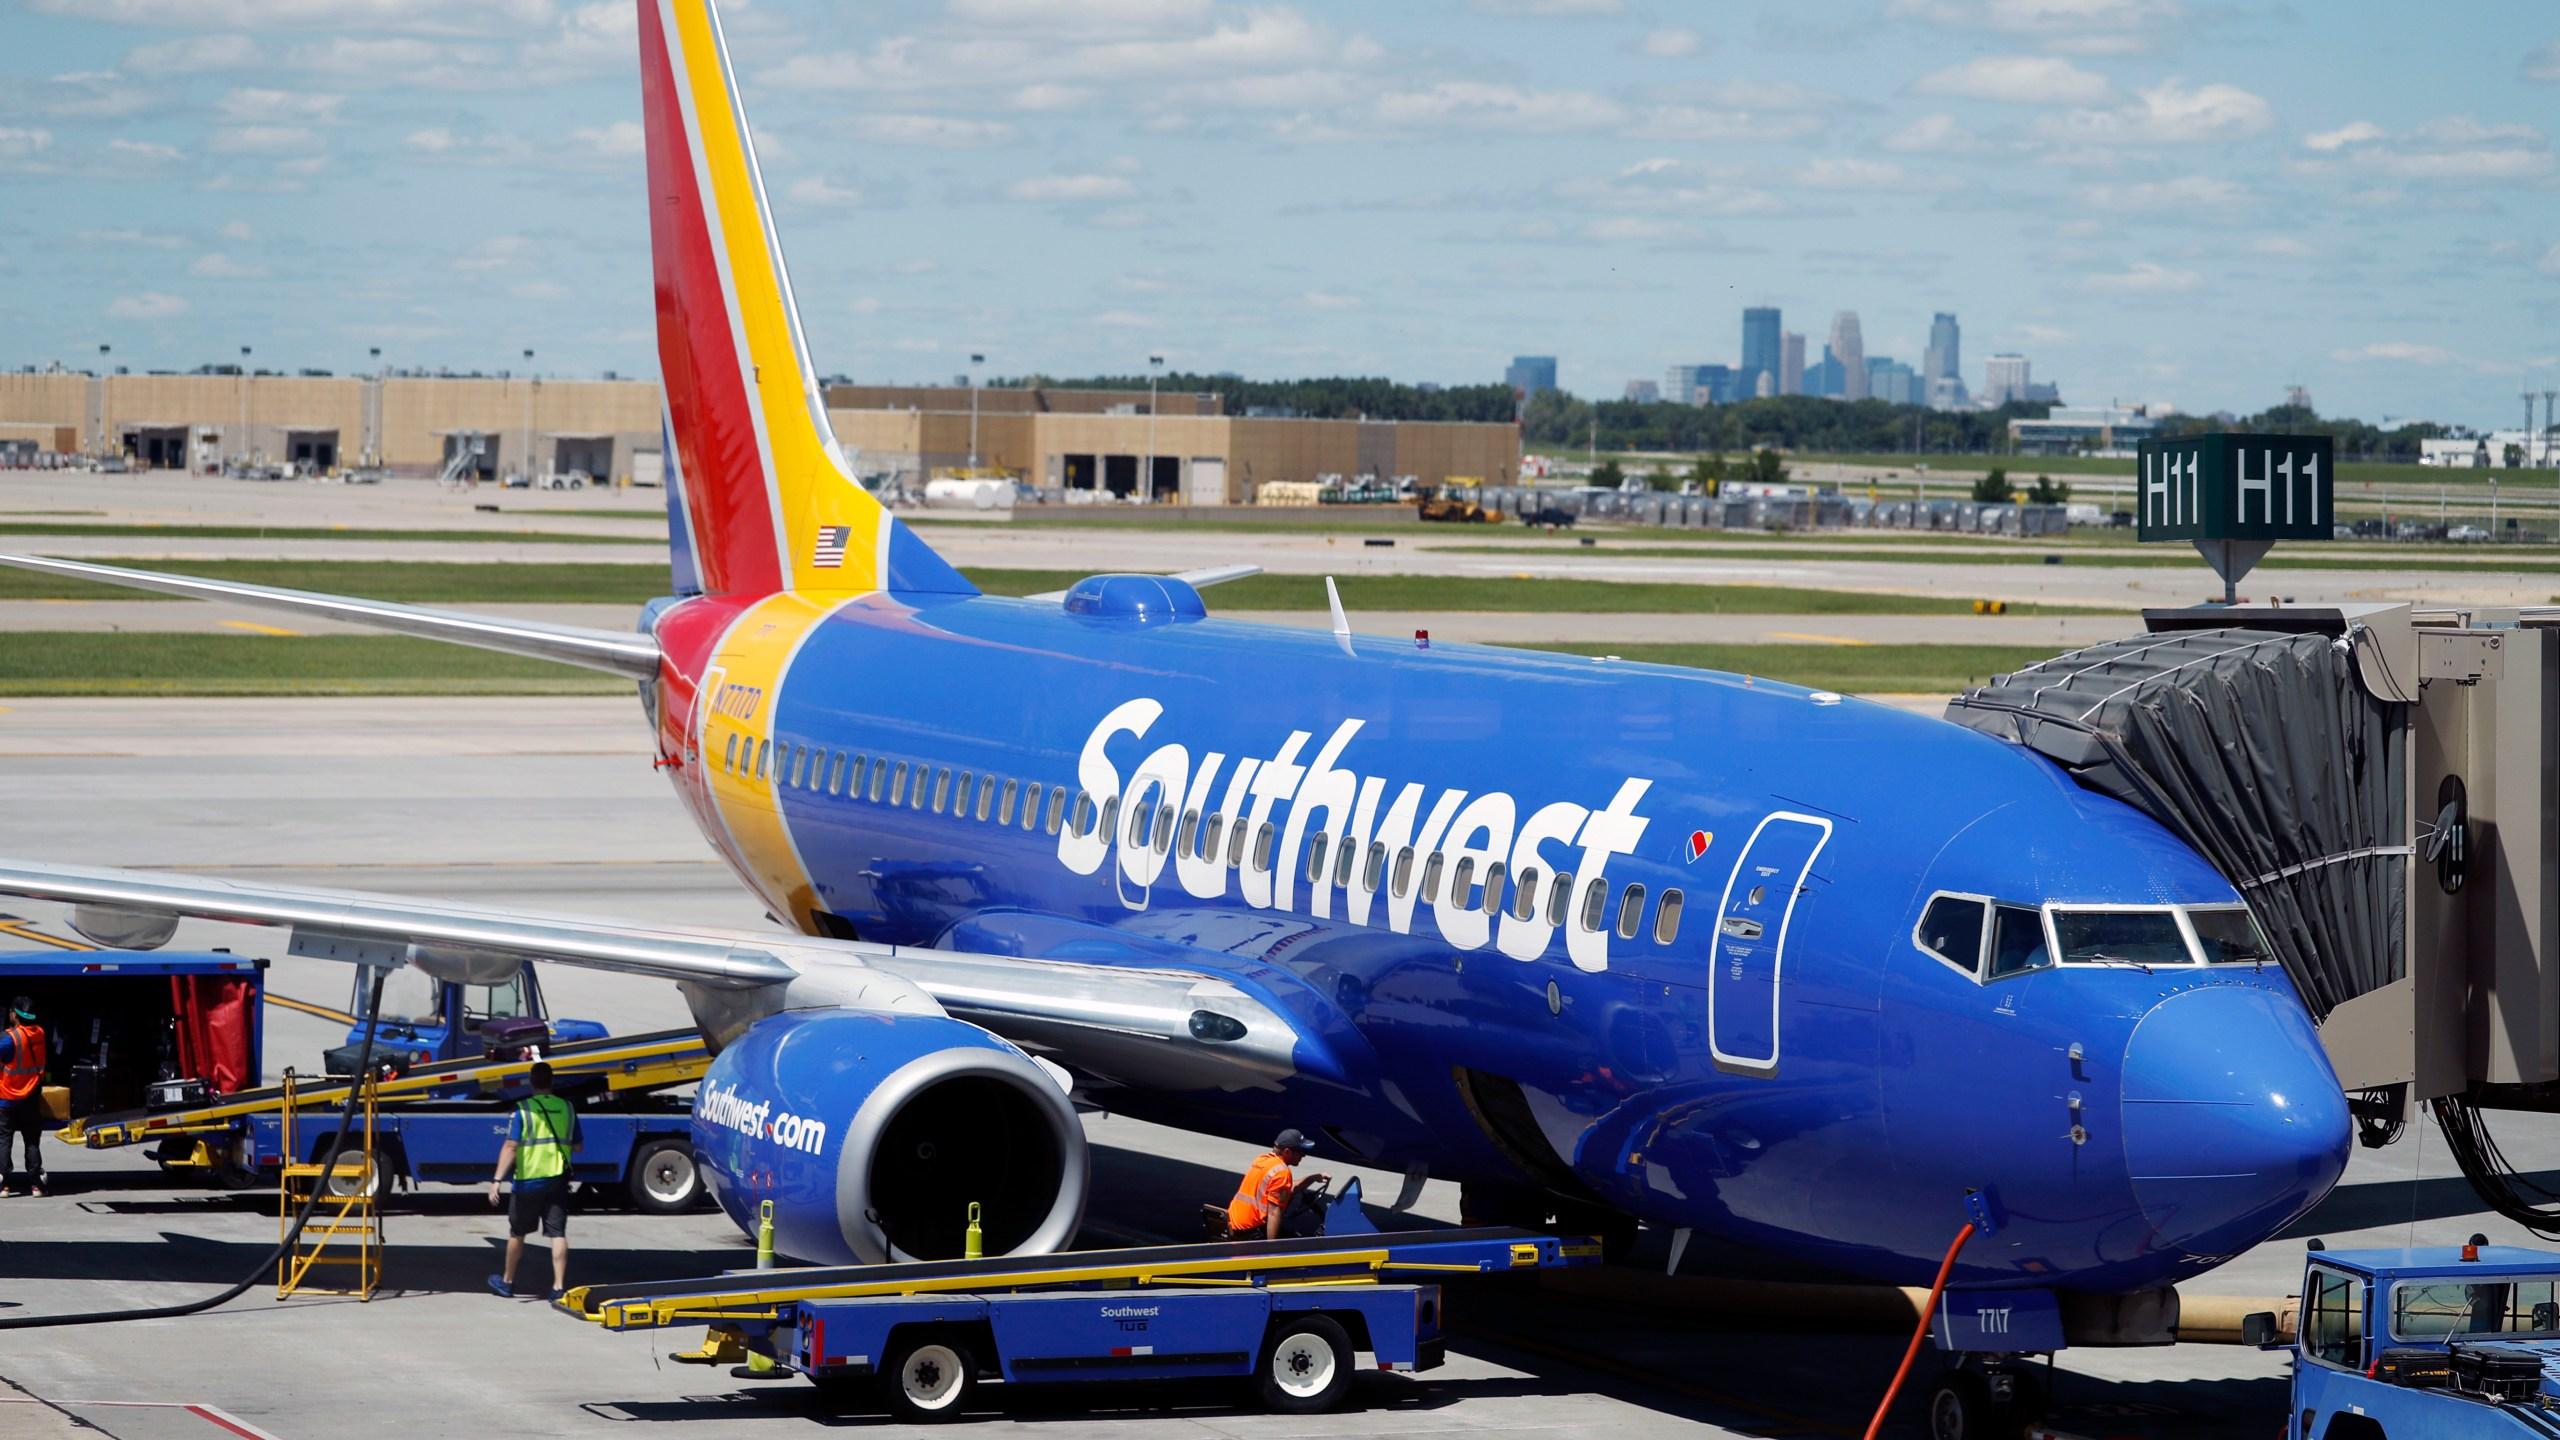 Earns_Southwest_Airlines_42751-159532.jpg85495734